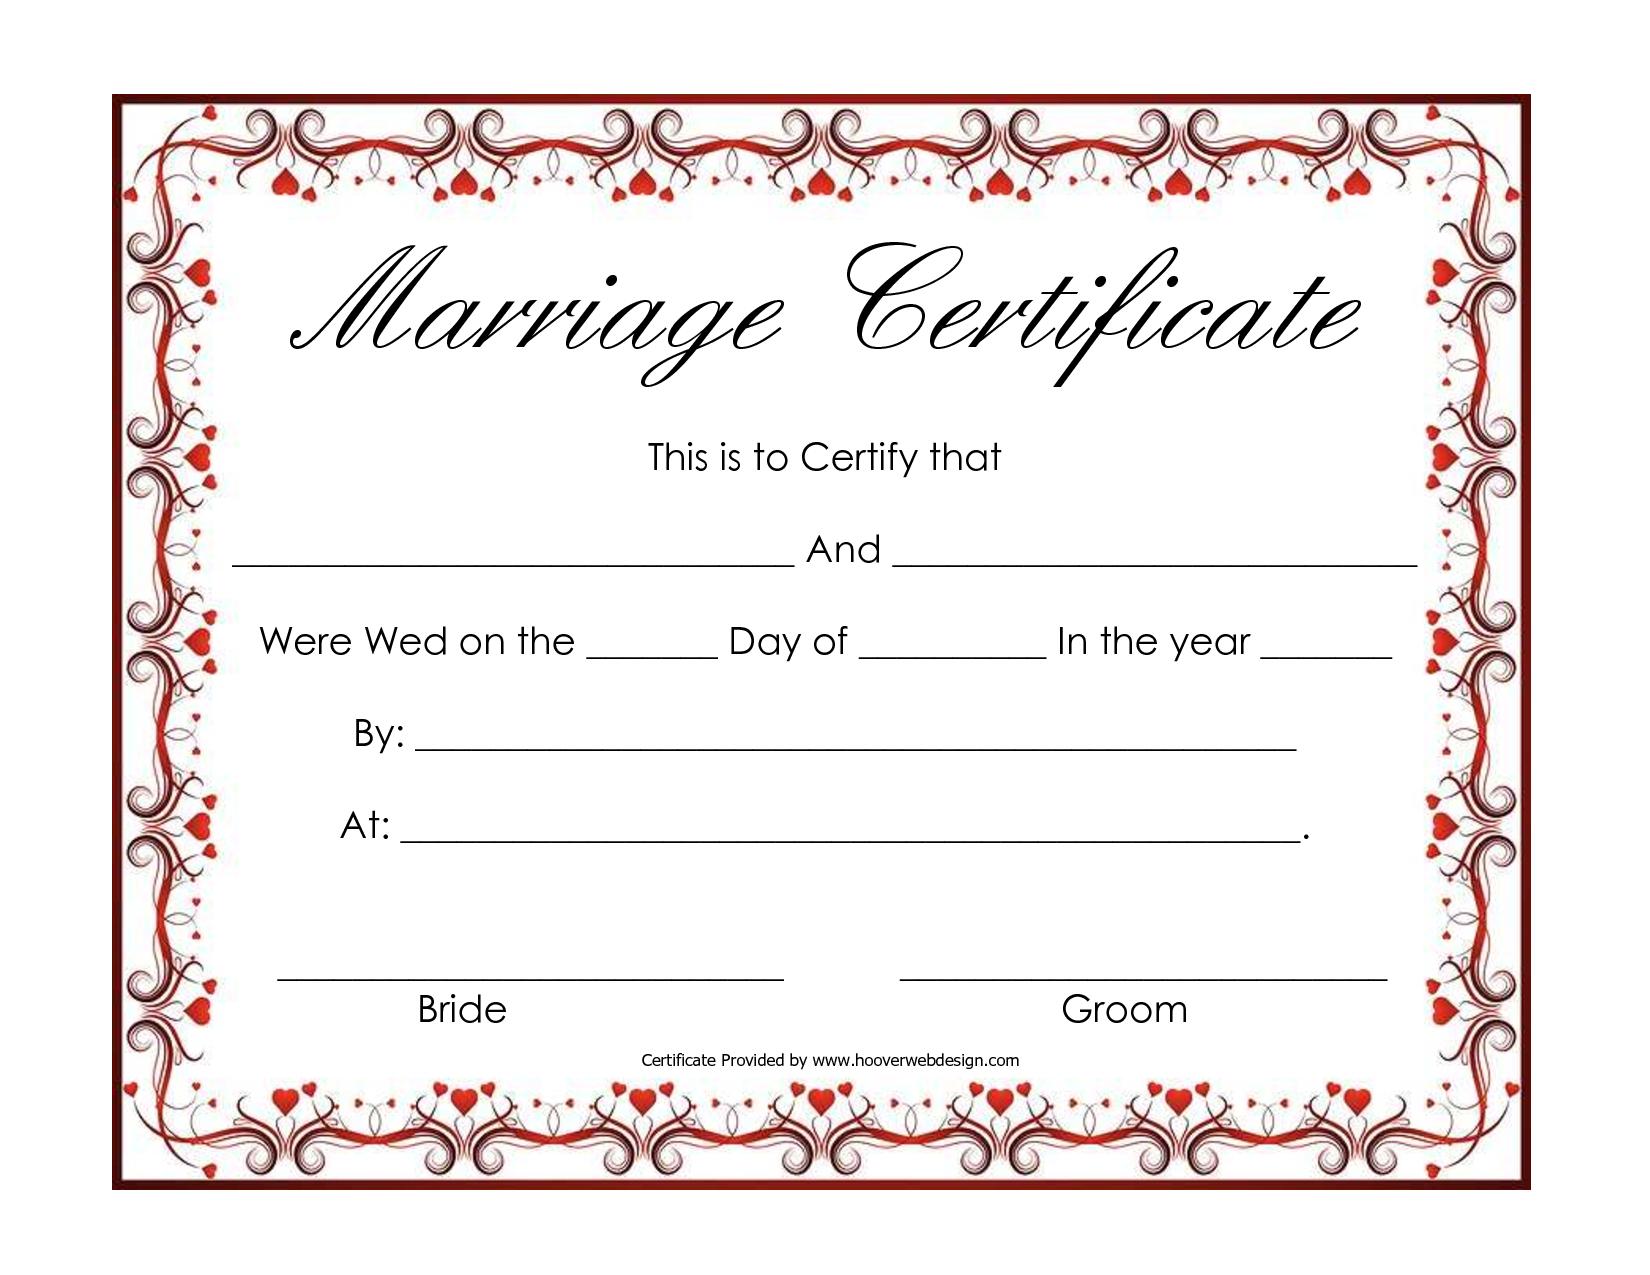 Free Blank Marriage Certificates | Printable Marriage Certificate - Free Printable Wedding Certificates